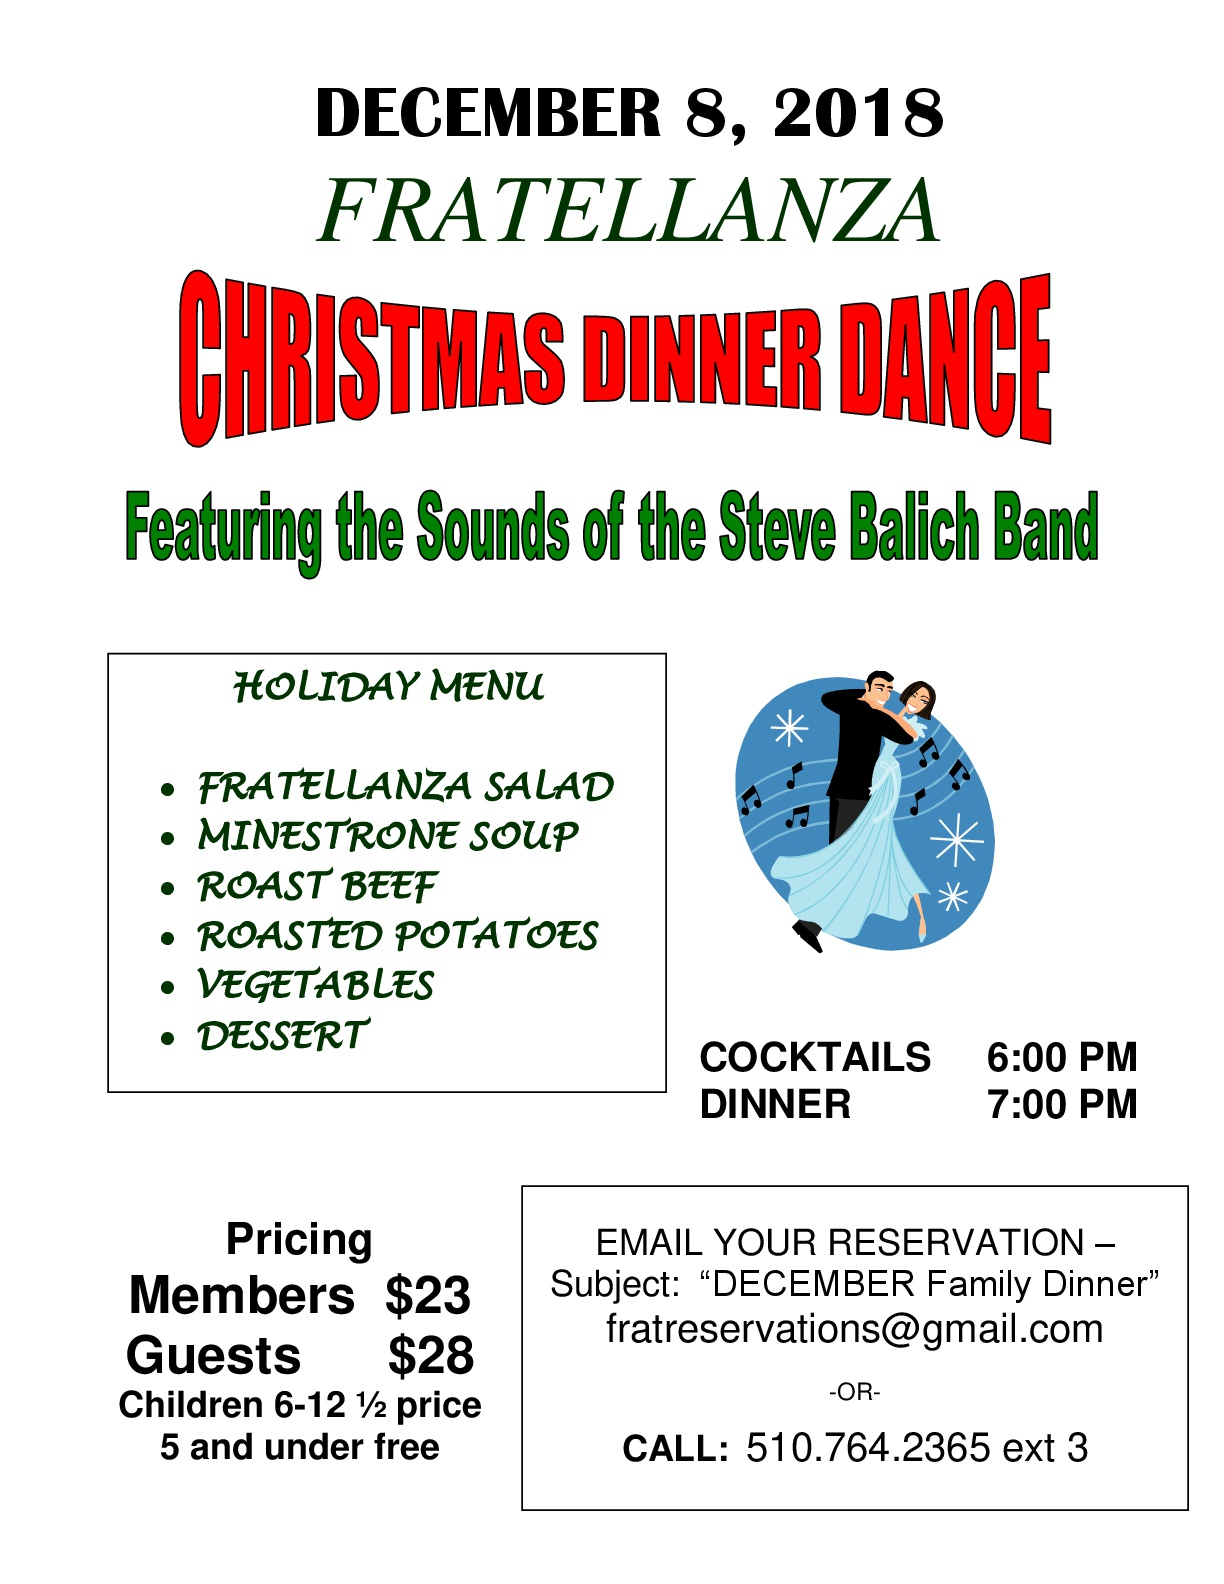 Christmas Dinner Dance – DEC 8 – Fratellanza Club